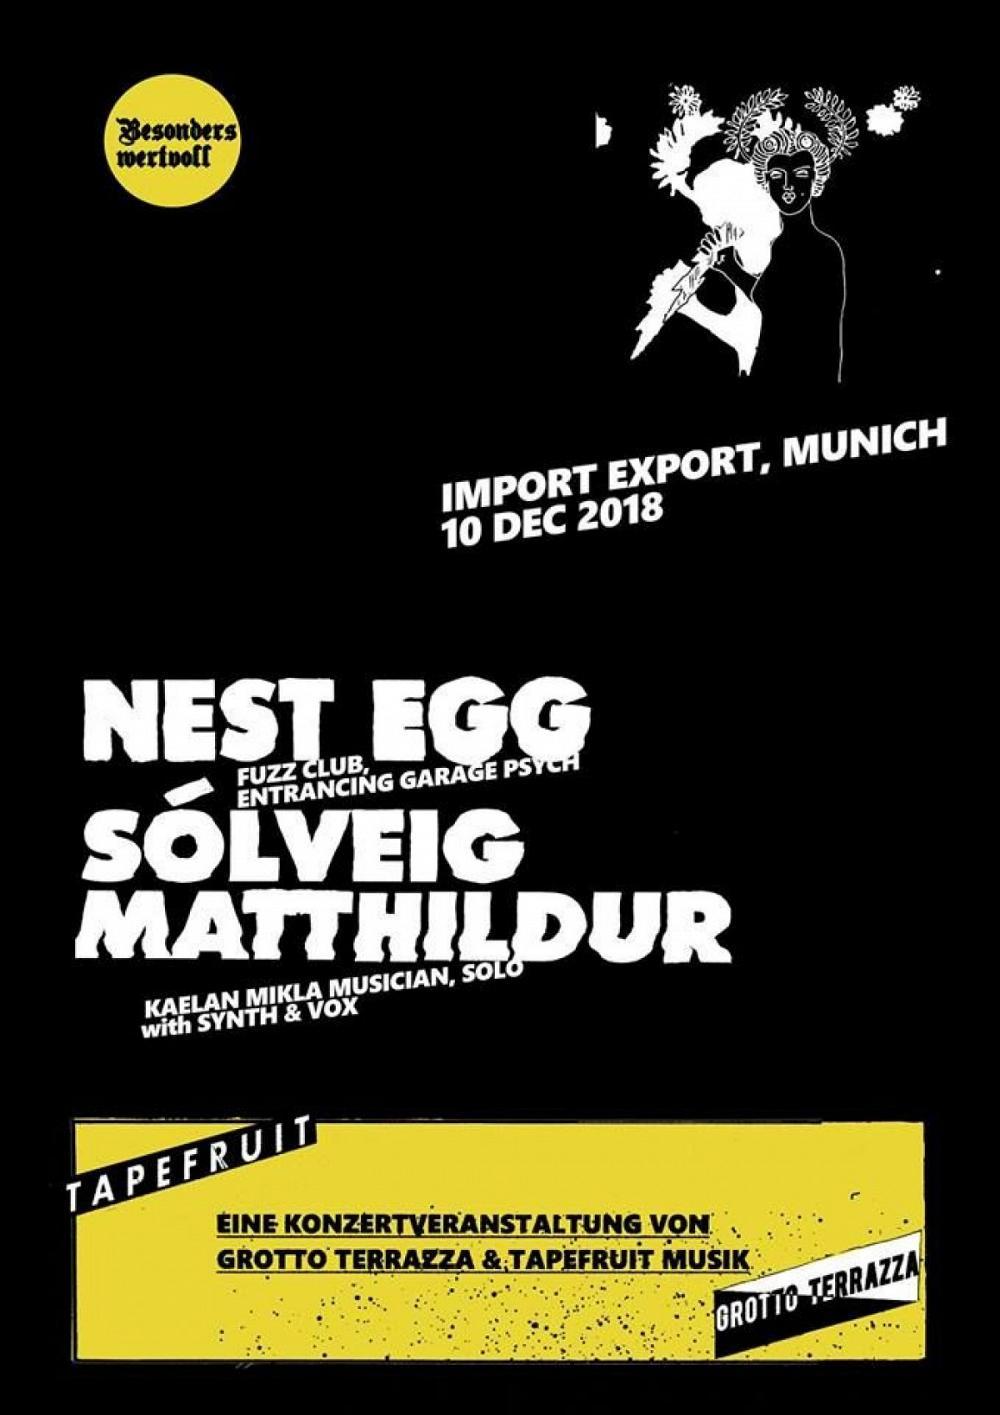 Tapefruit Konzert: Nest Egg + Sólveig Matthildur | 10.12.2018 @ Import Export